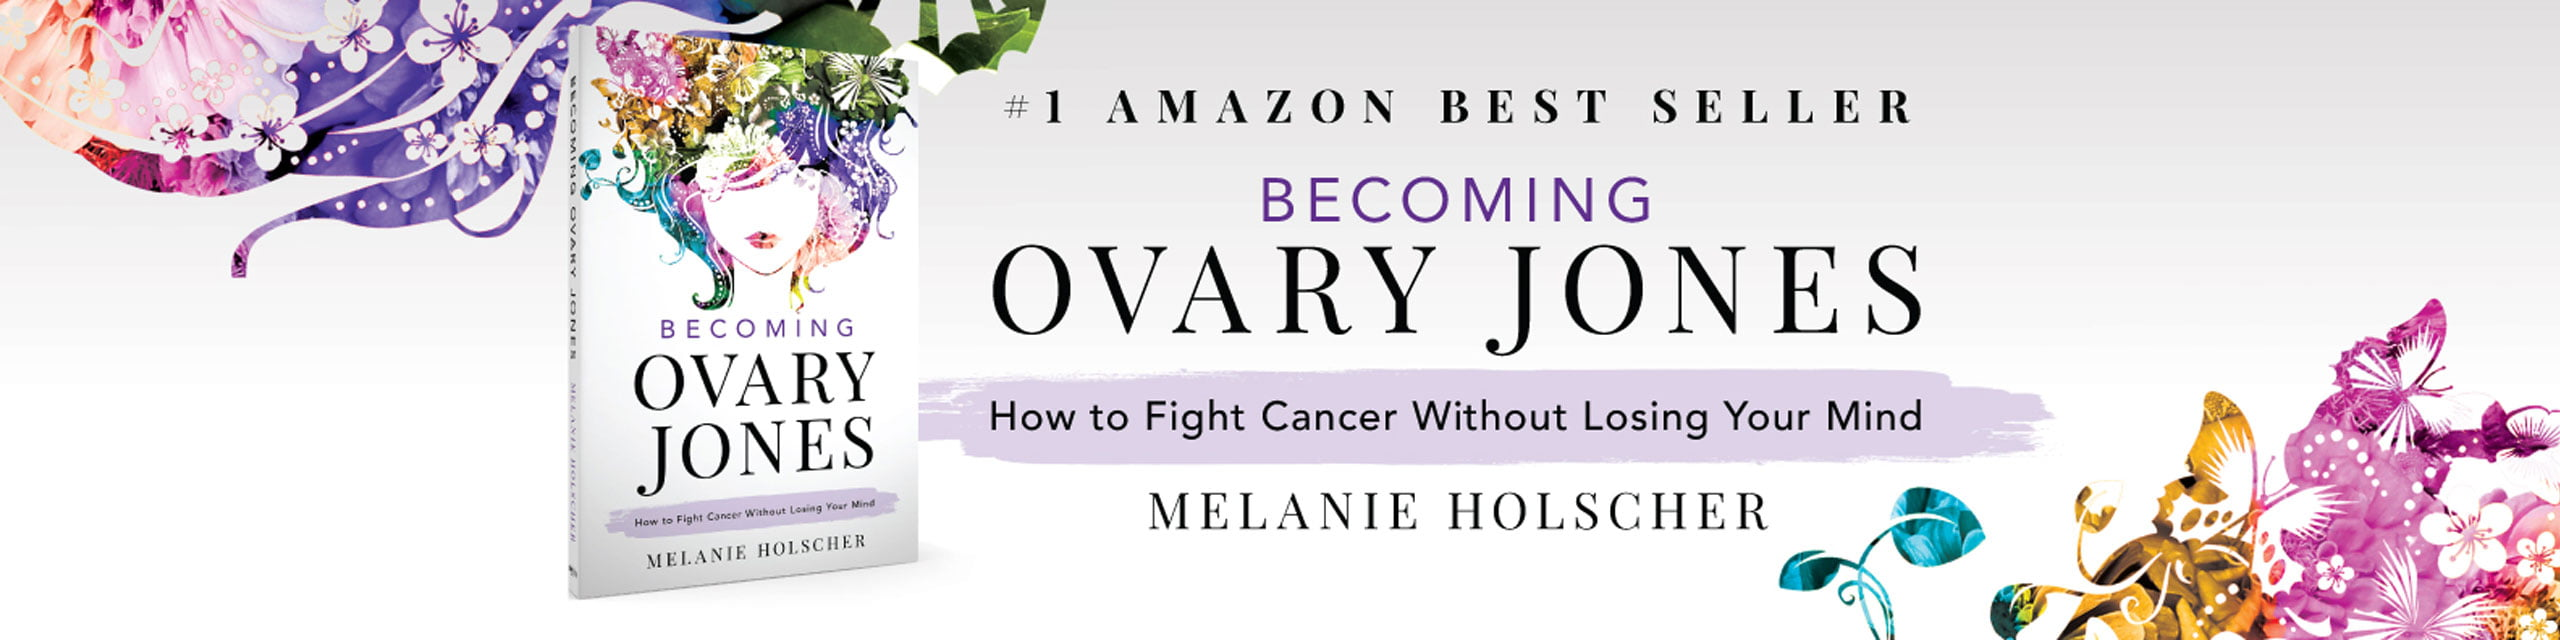 #1 amazon best seller - becoming ovary jones